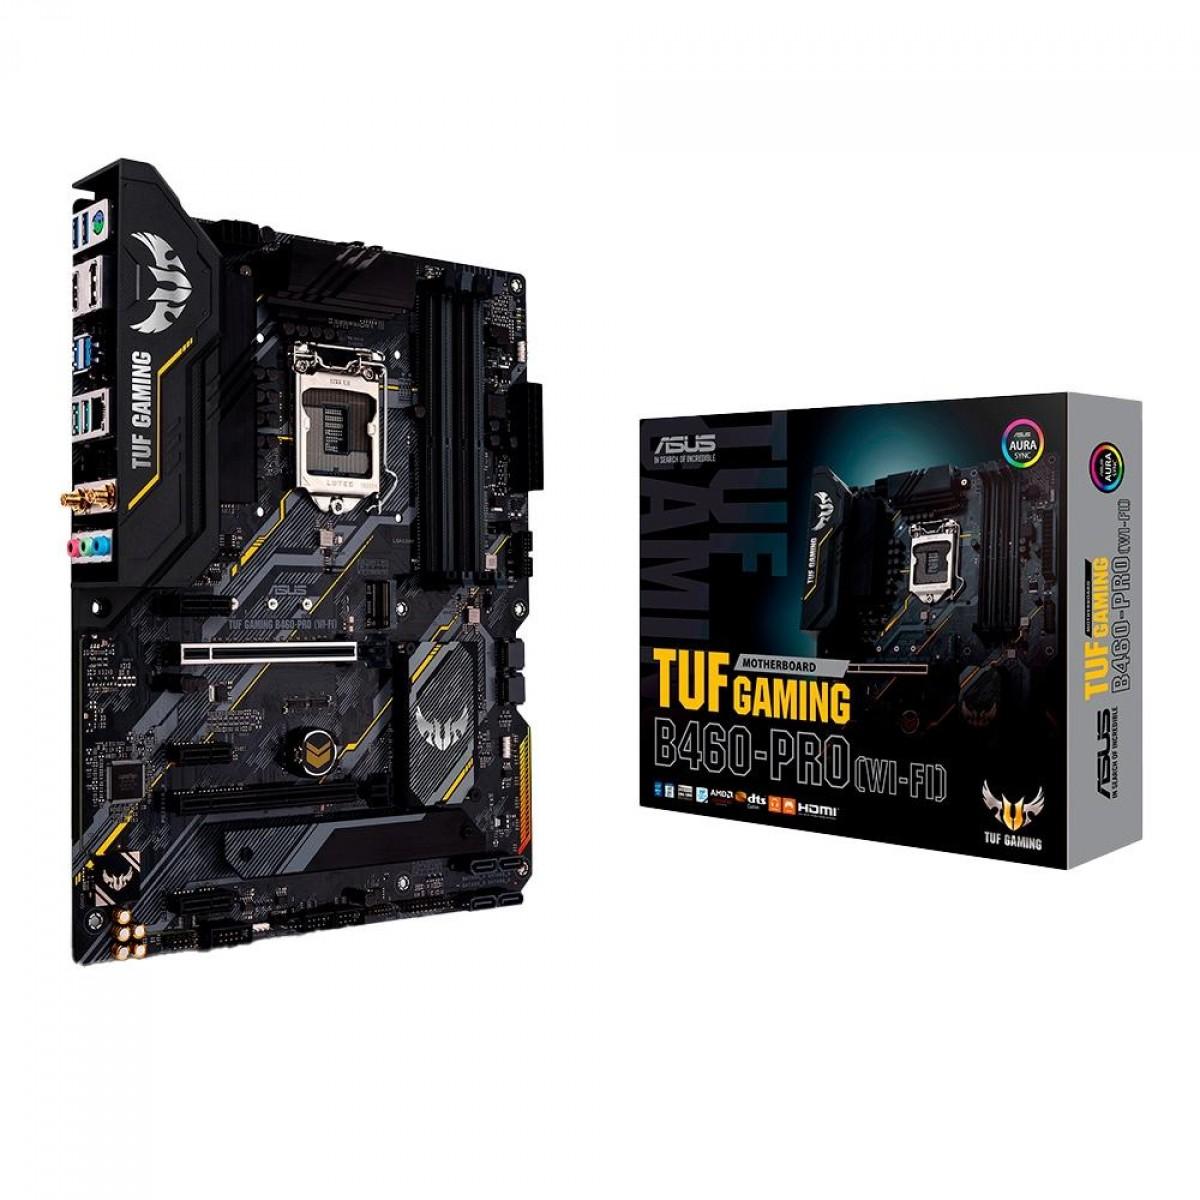 Placa Mãe Asus TUF Z390-Pro Gaming, Chipset Z390, Intel LGA 1151, ATX, DDR4